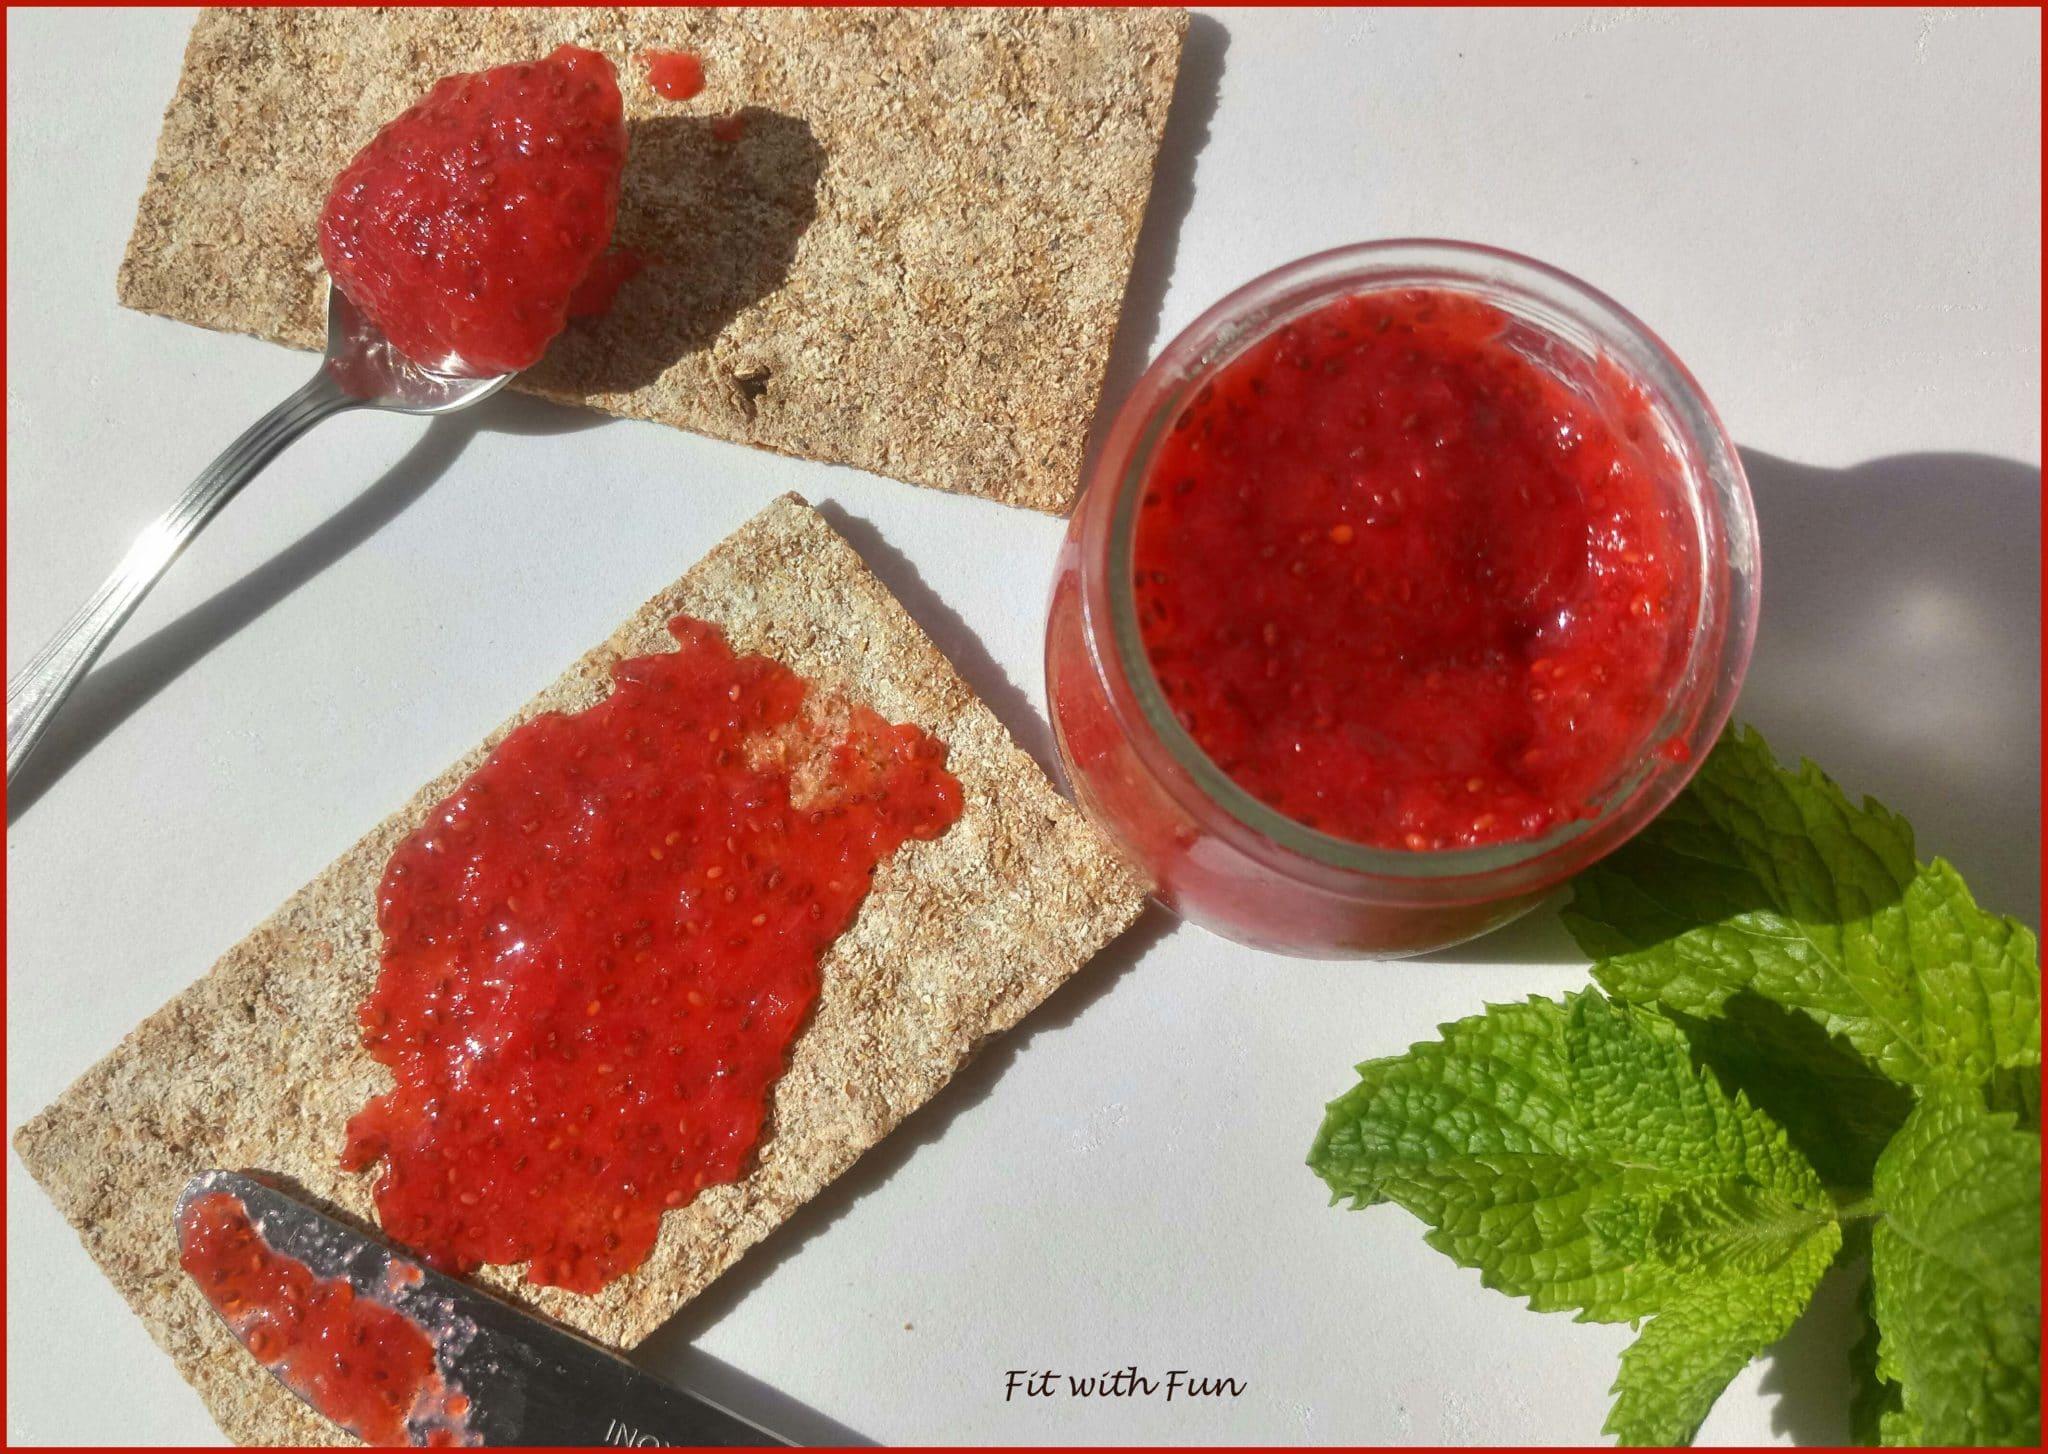 Marmellata di Frutta senza Zucchero e senza Cottura